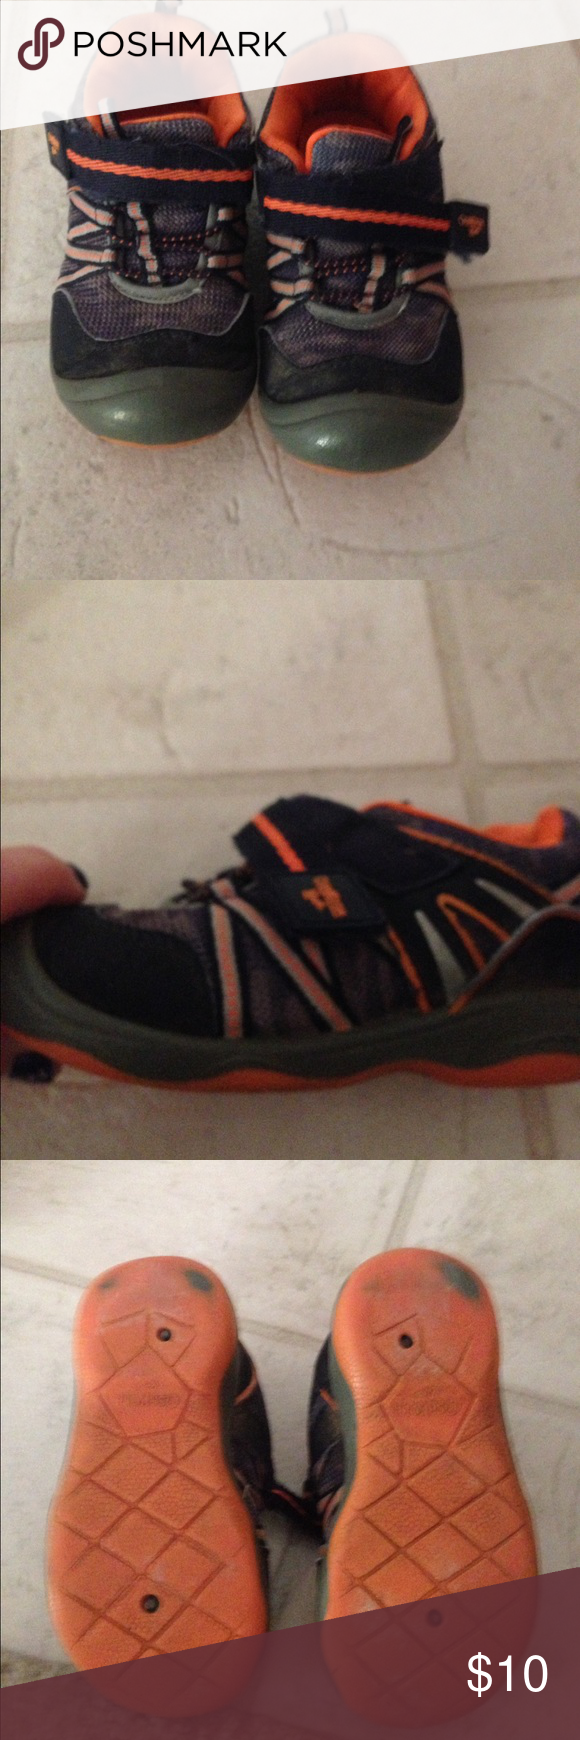 Oshkosh b gosh boys size 10 shoes Good used condition. Osh Kosh Shoes Sneakers